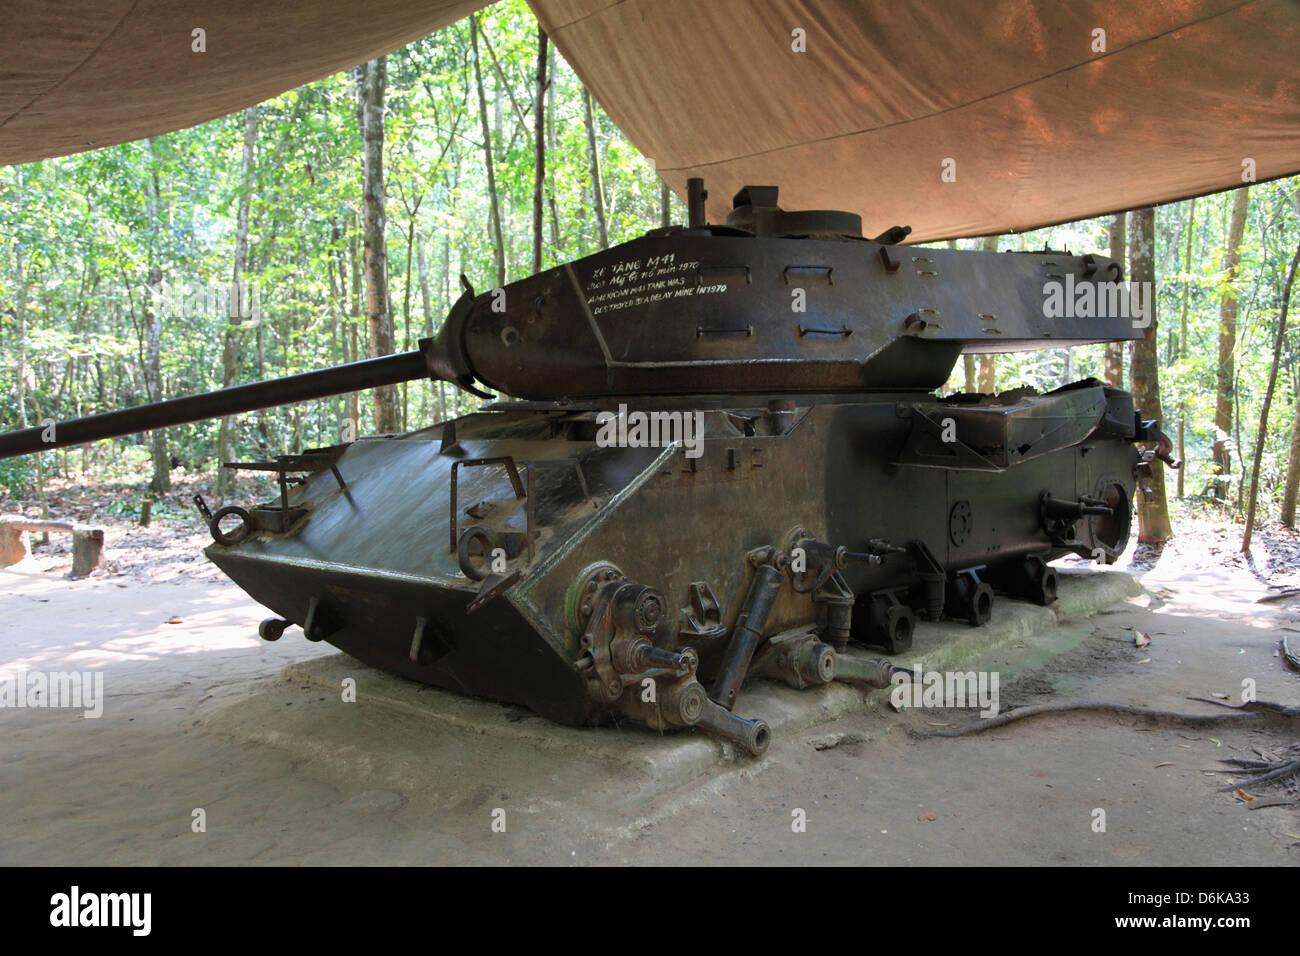 Tank, Cu Chi Tunnels, Ho Chi Minh City (Saigon), Vietnam, Indochina, Southeast Asia, Asia - Stock Image